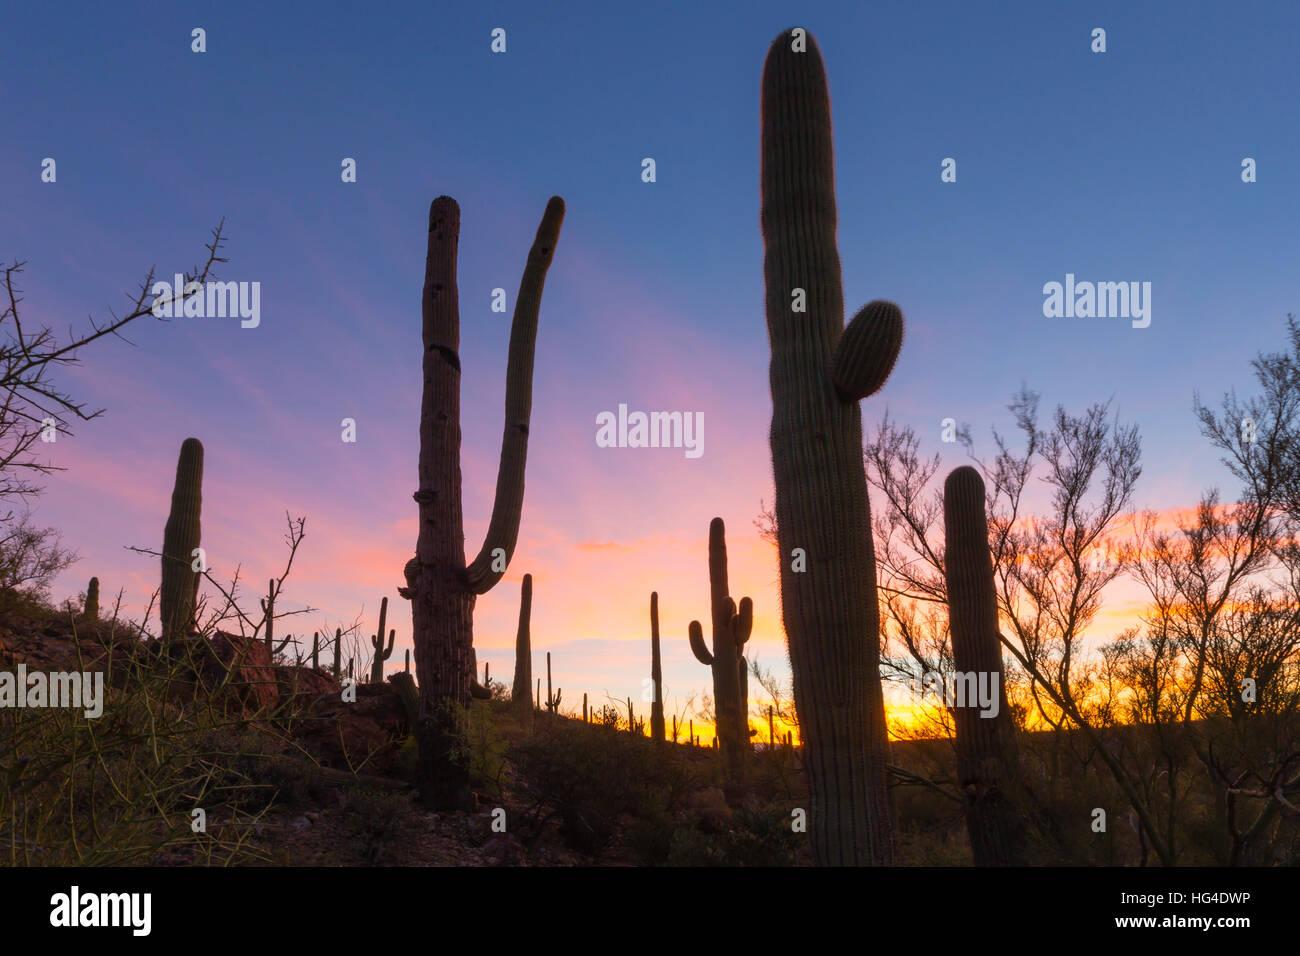 Giant saguaro cactus (Carnegiea gigantea) at dawn in the Sweetwater Preserve, Tucson, Arizona, USA, North America - Stock Image